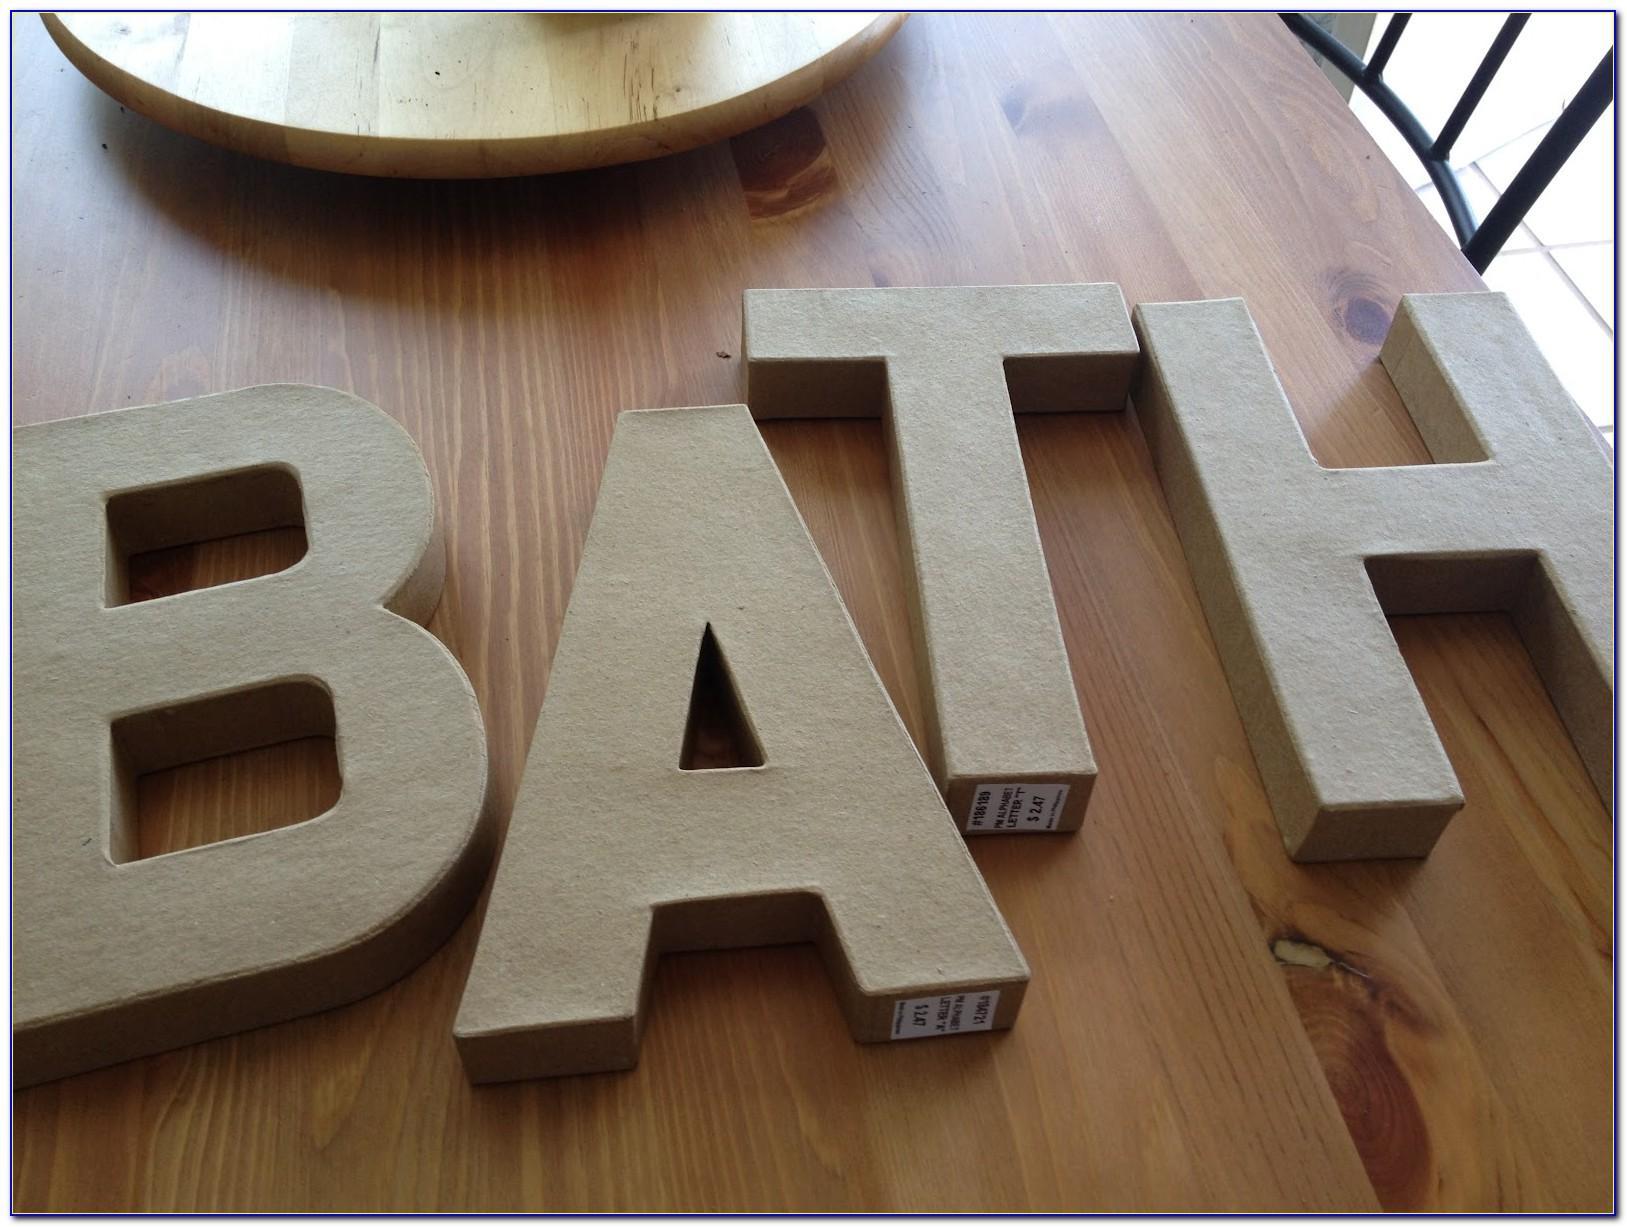 Hobby Lobby Cardboard Letters